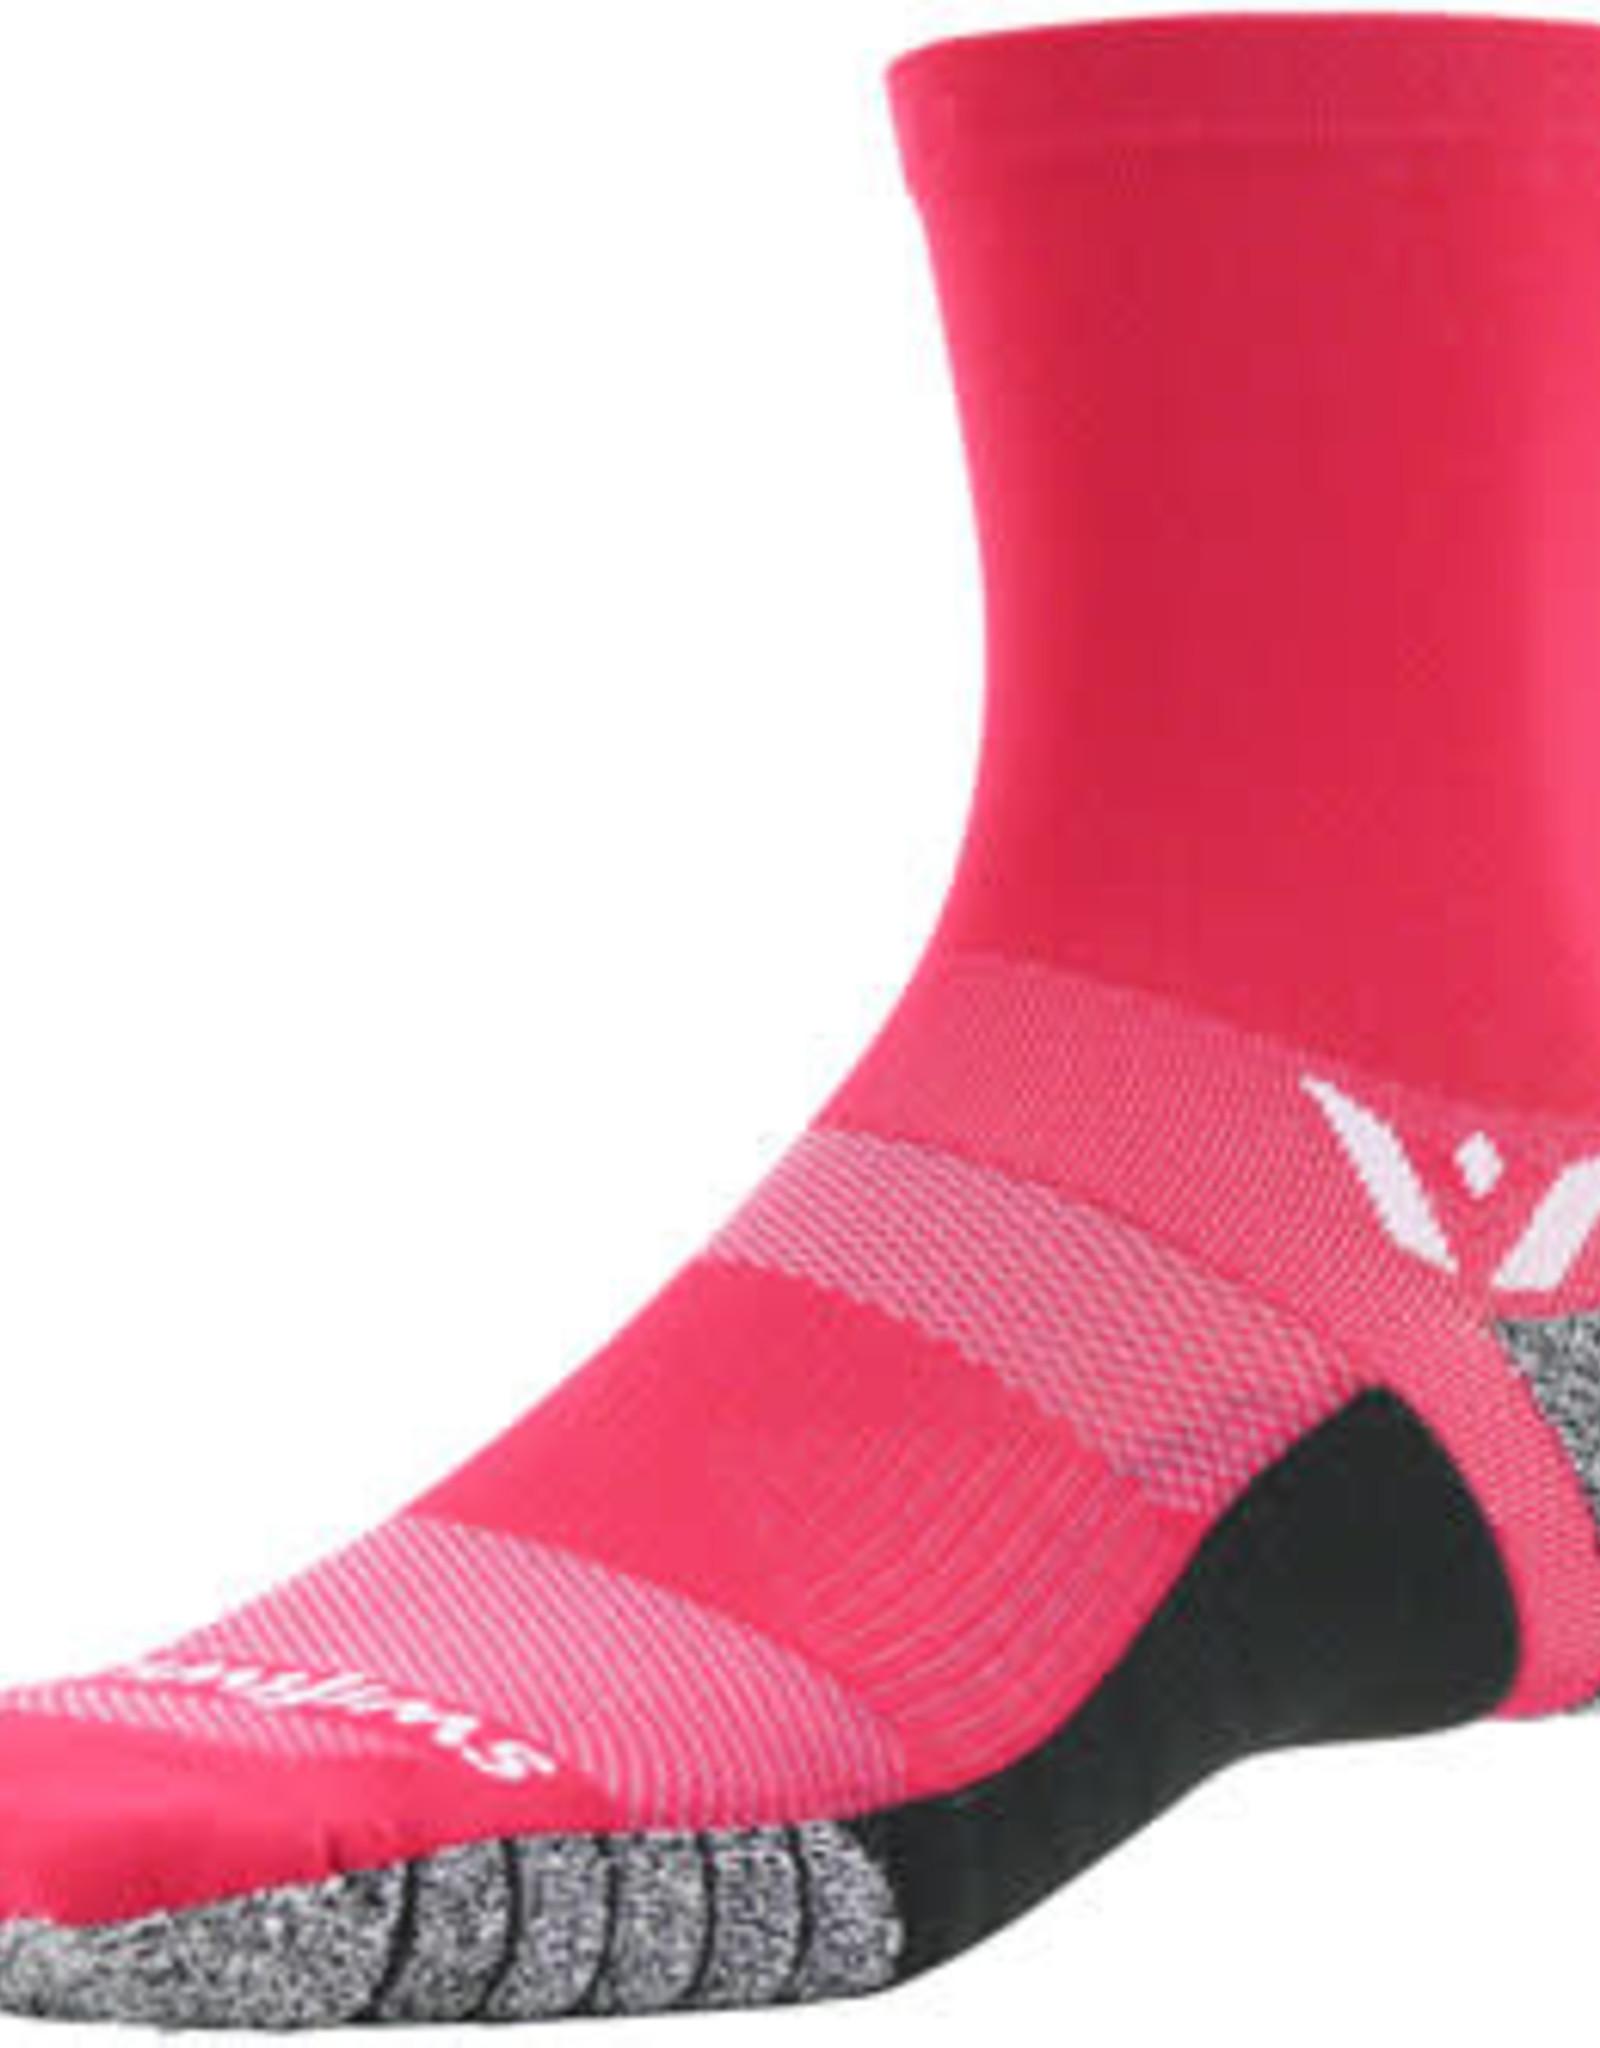 Swiftwick Swiftwick Flite XT Five Socks - 5 inch, Pink, Large